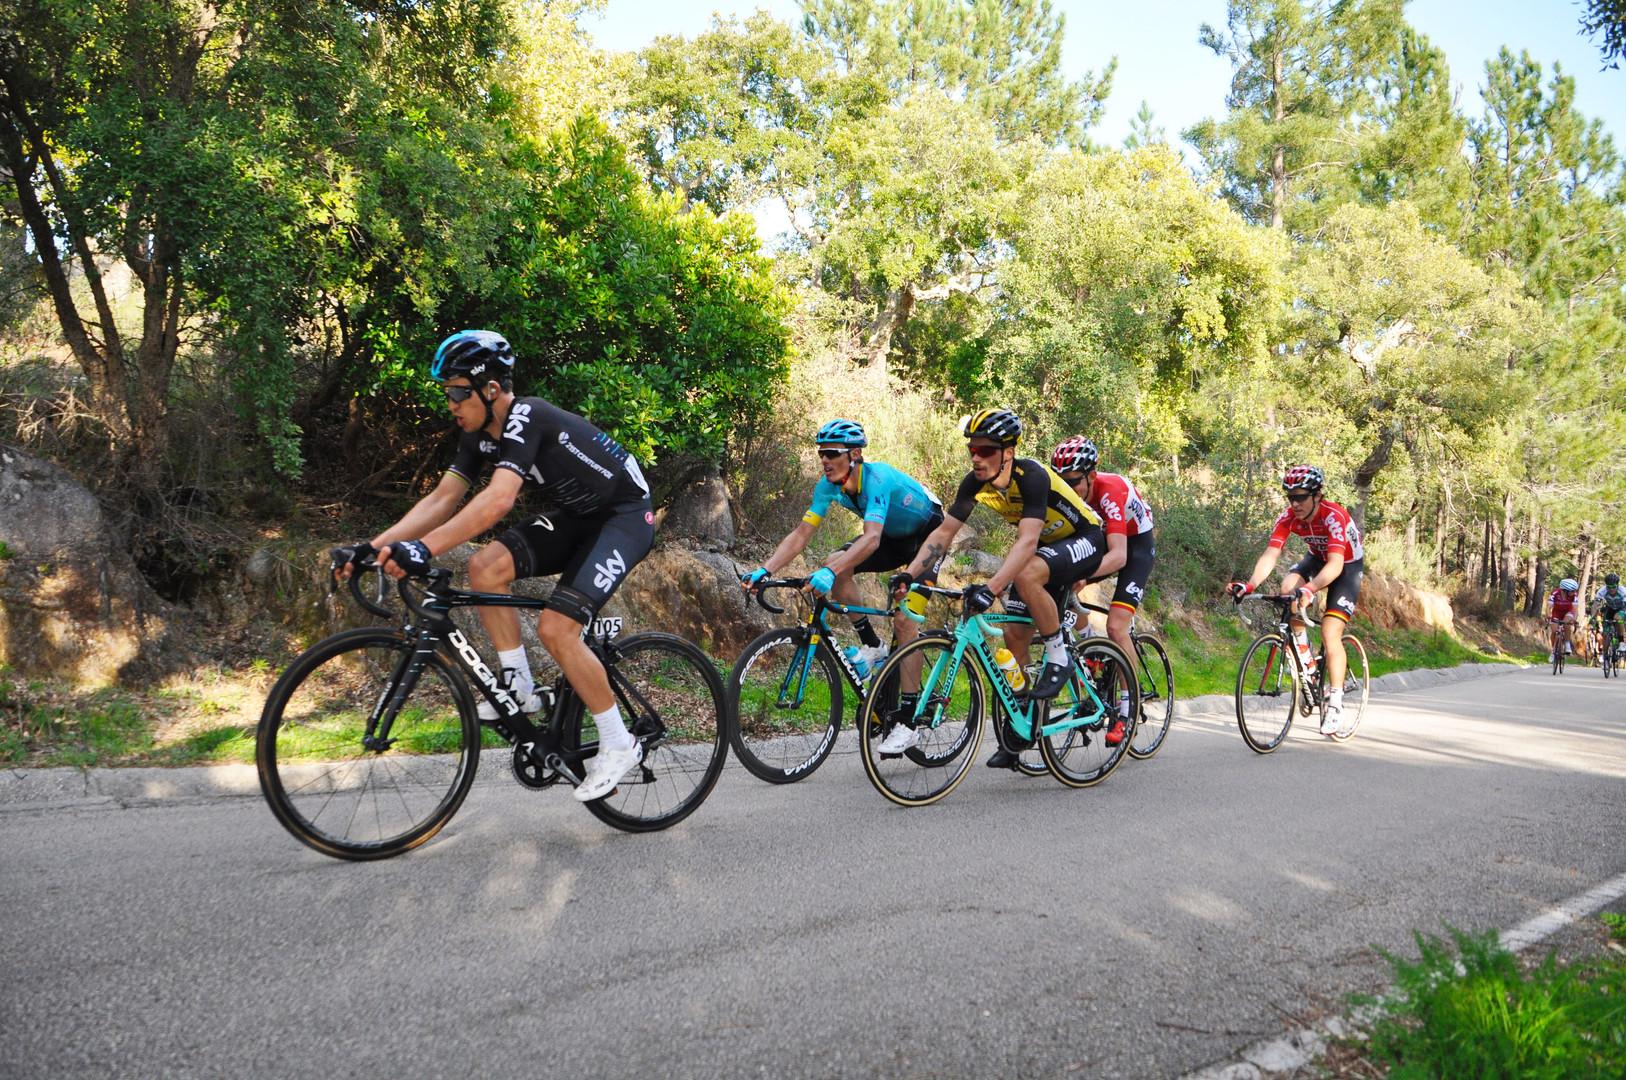 Cyclistes en Algarve bike tours algarve